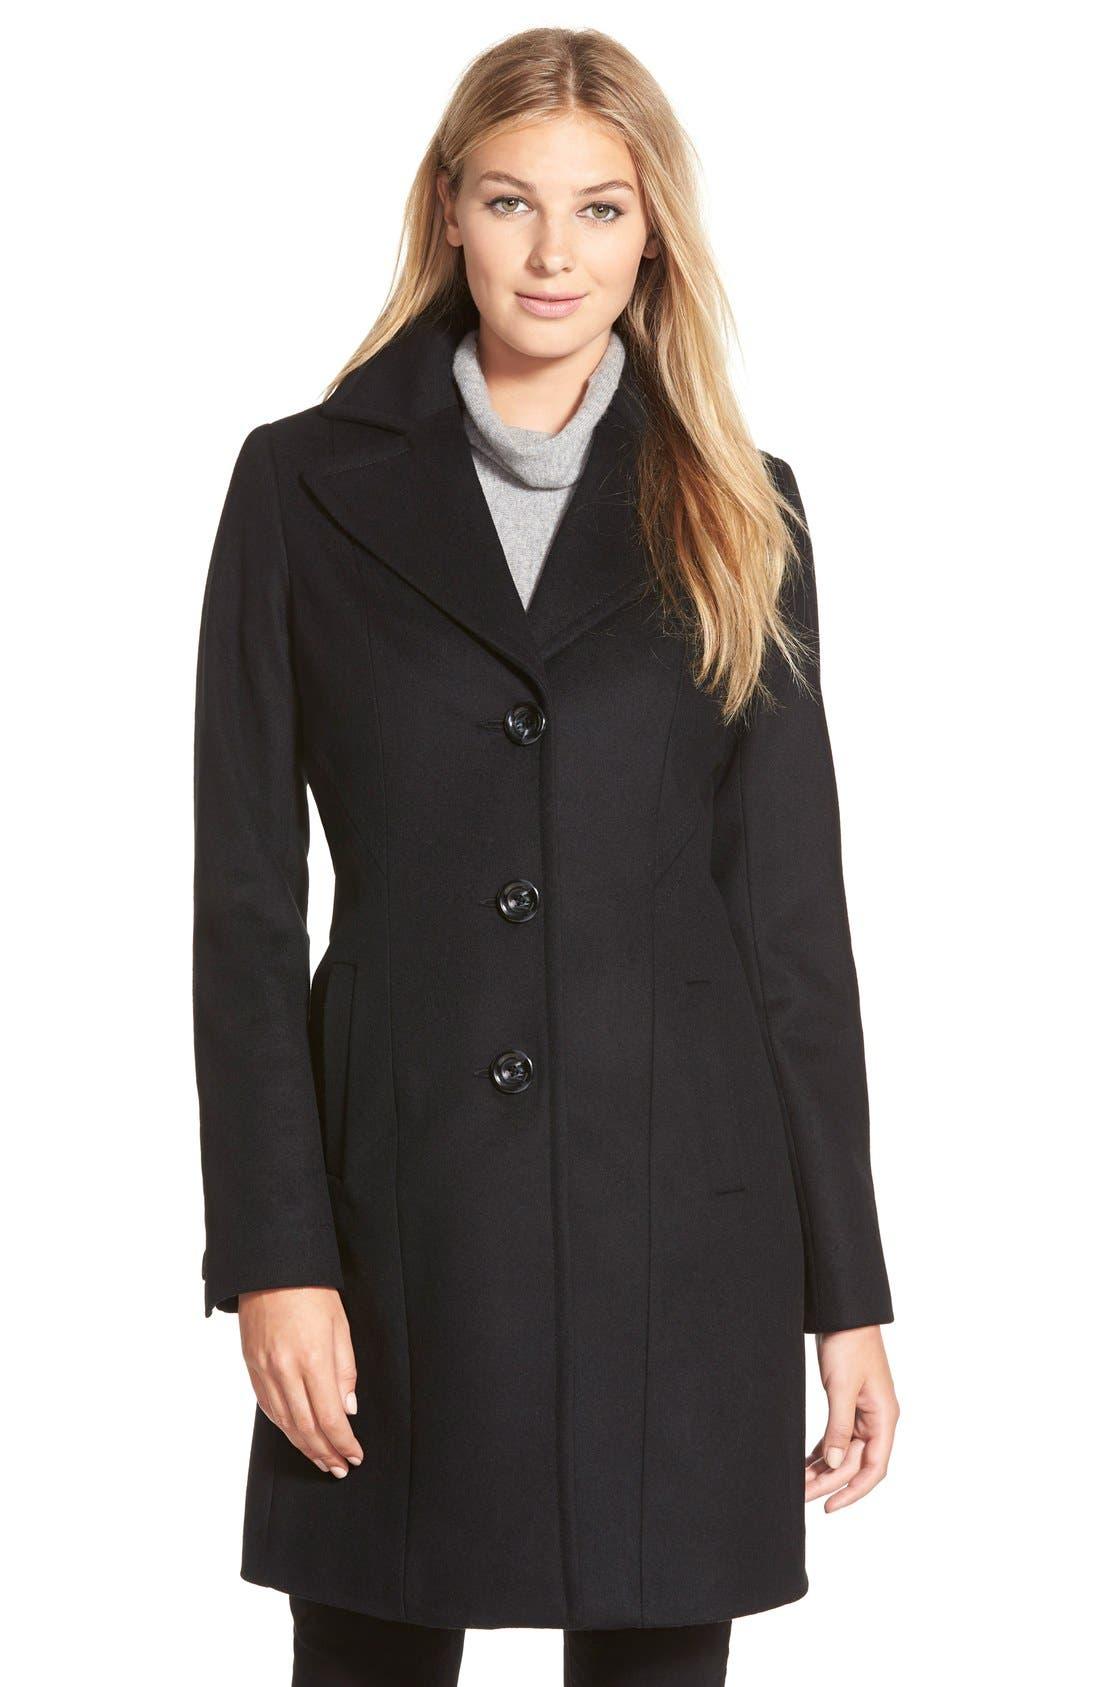 Alternate Image 1 Selected - Kristen Blake Single Breasted Wool Blend Coat (Regular & Petite)